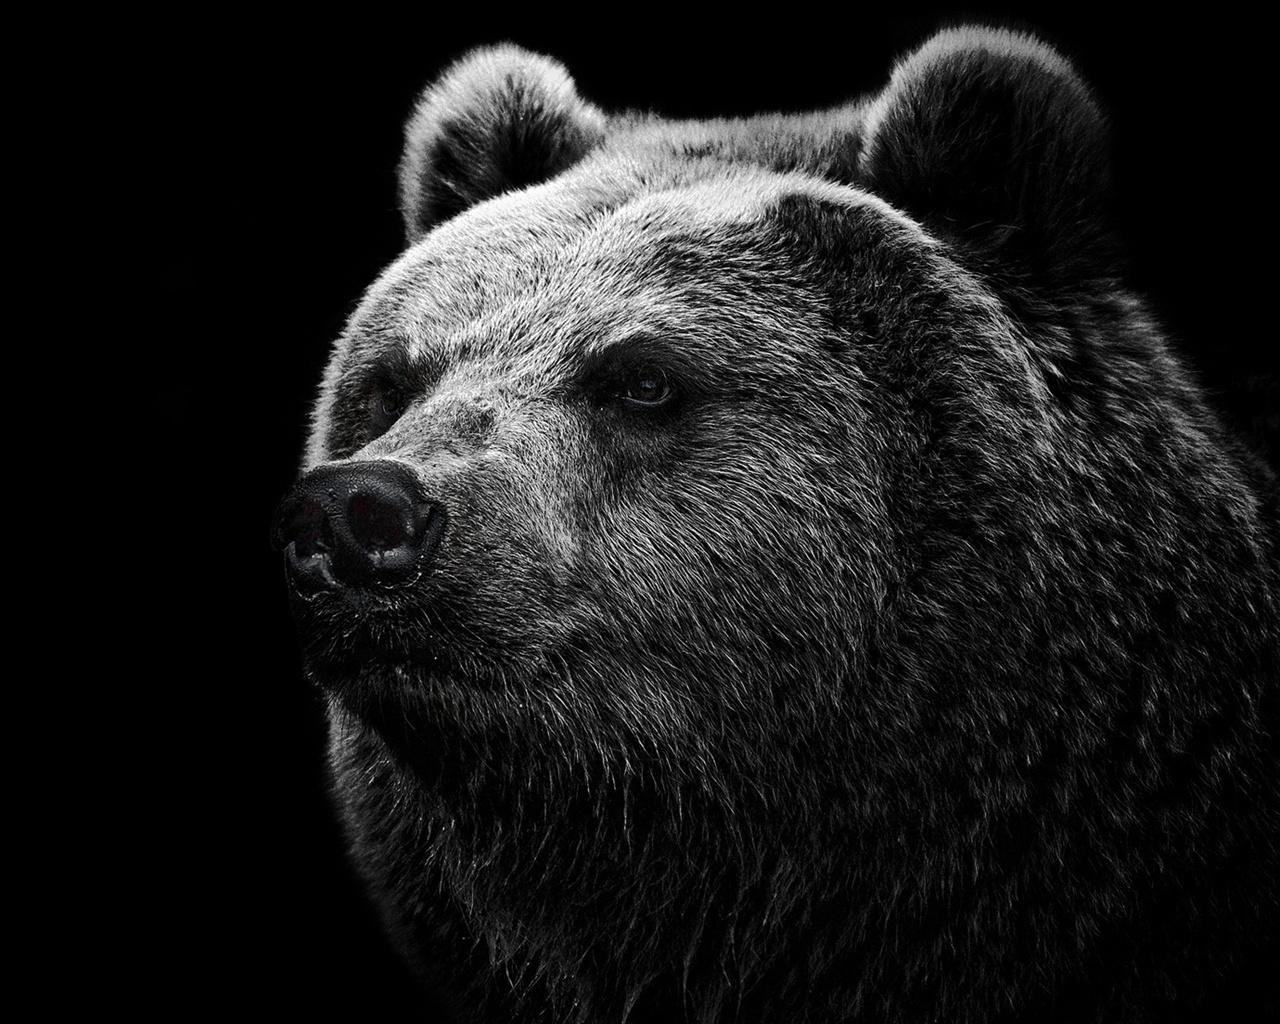 Leopard 4k Black Background Hd Animals 4k Wallpapers: 壁紙 黒い背景黒クマ 1920x1200 HD 無料のデスクトップの背景, 画像